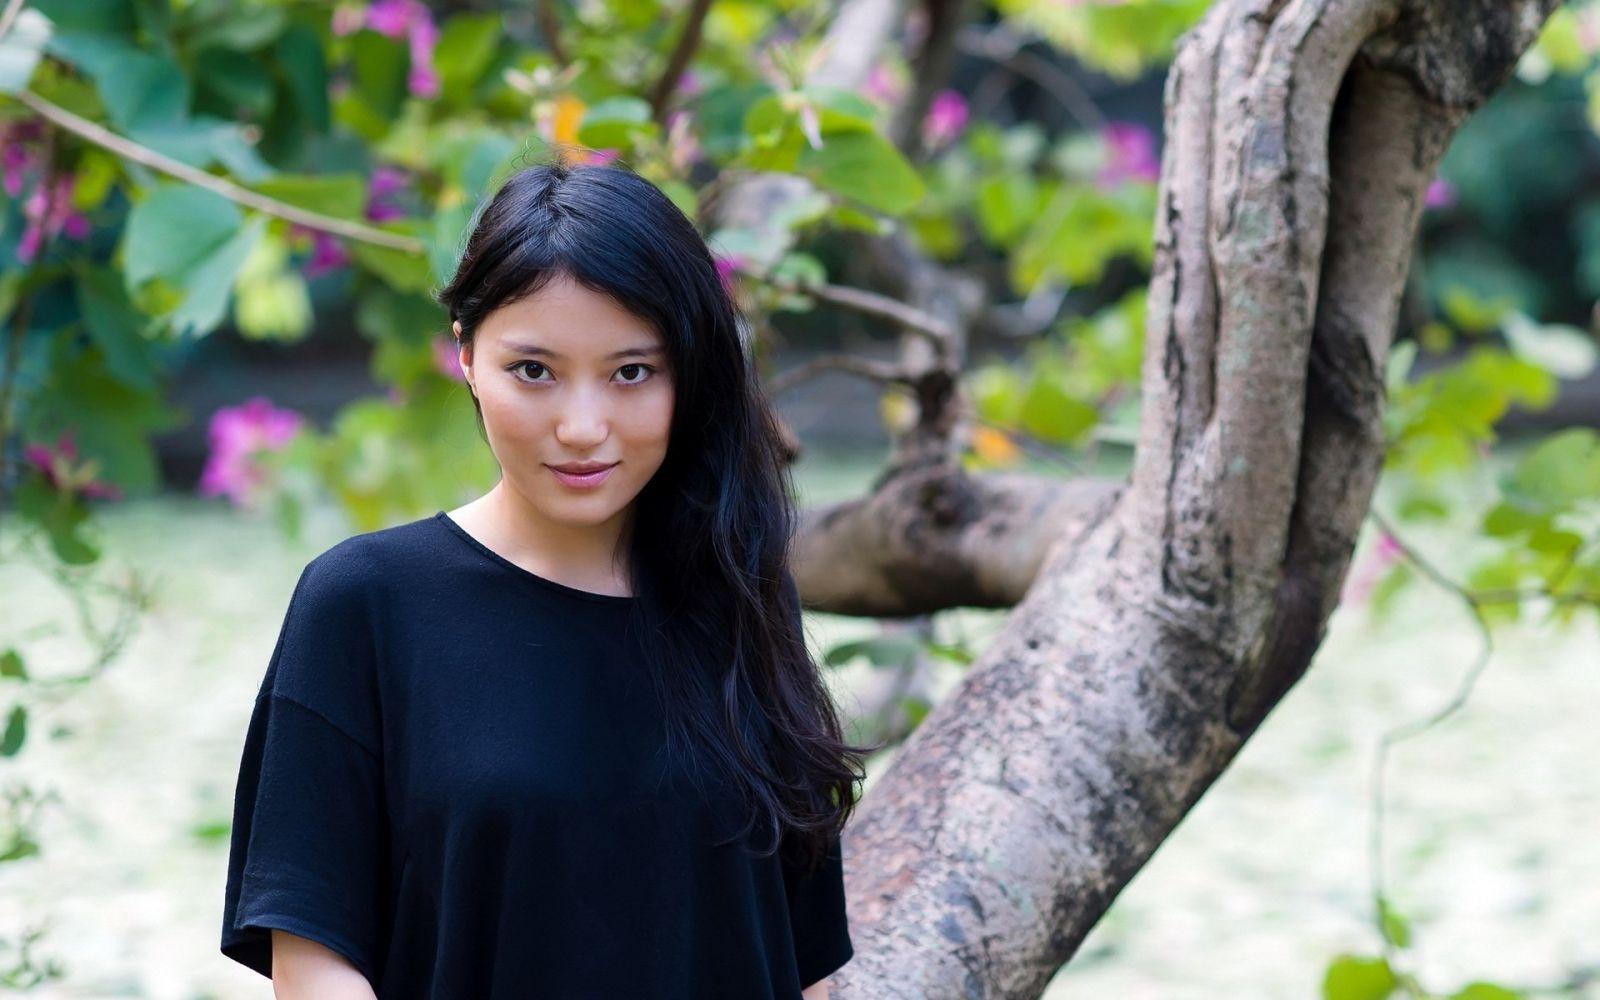 Regard half asian girls as beautiful #7